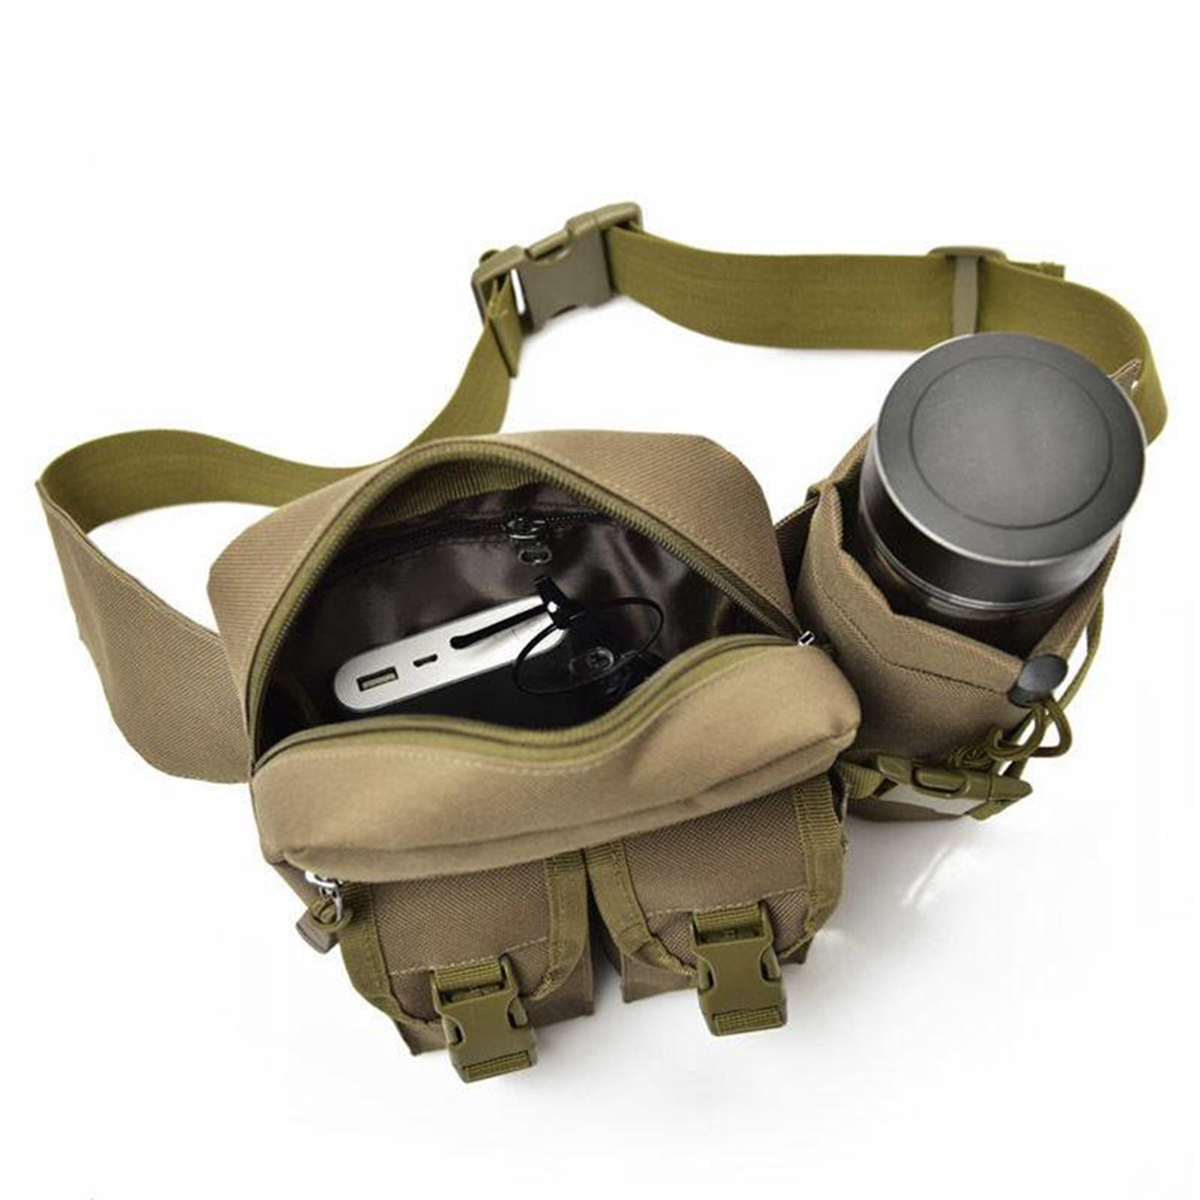 Men Outdoor Tactical Waist Fanny Pack Nylon Hip Bum Belt Chest Bag Water Bottle Holder Pouch Camping Hiking